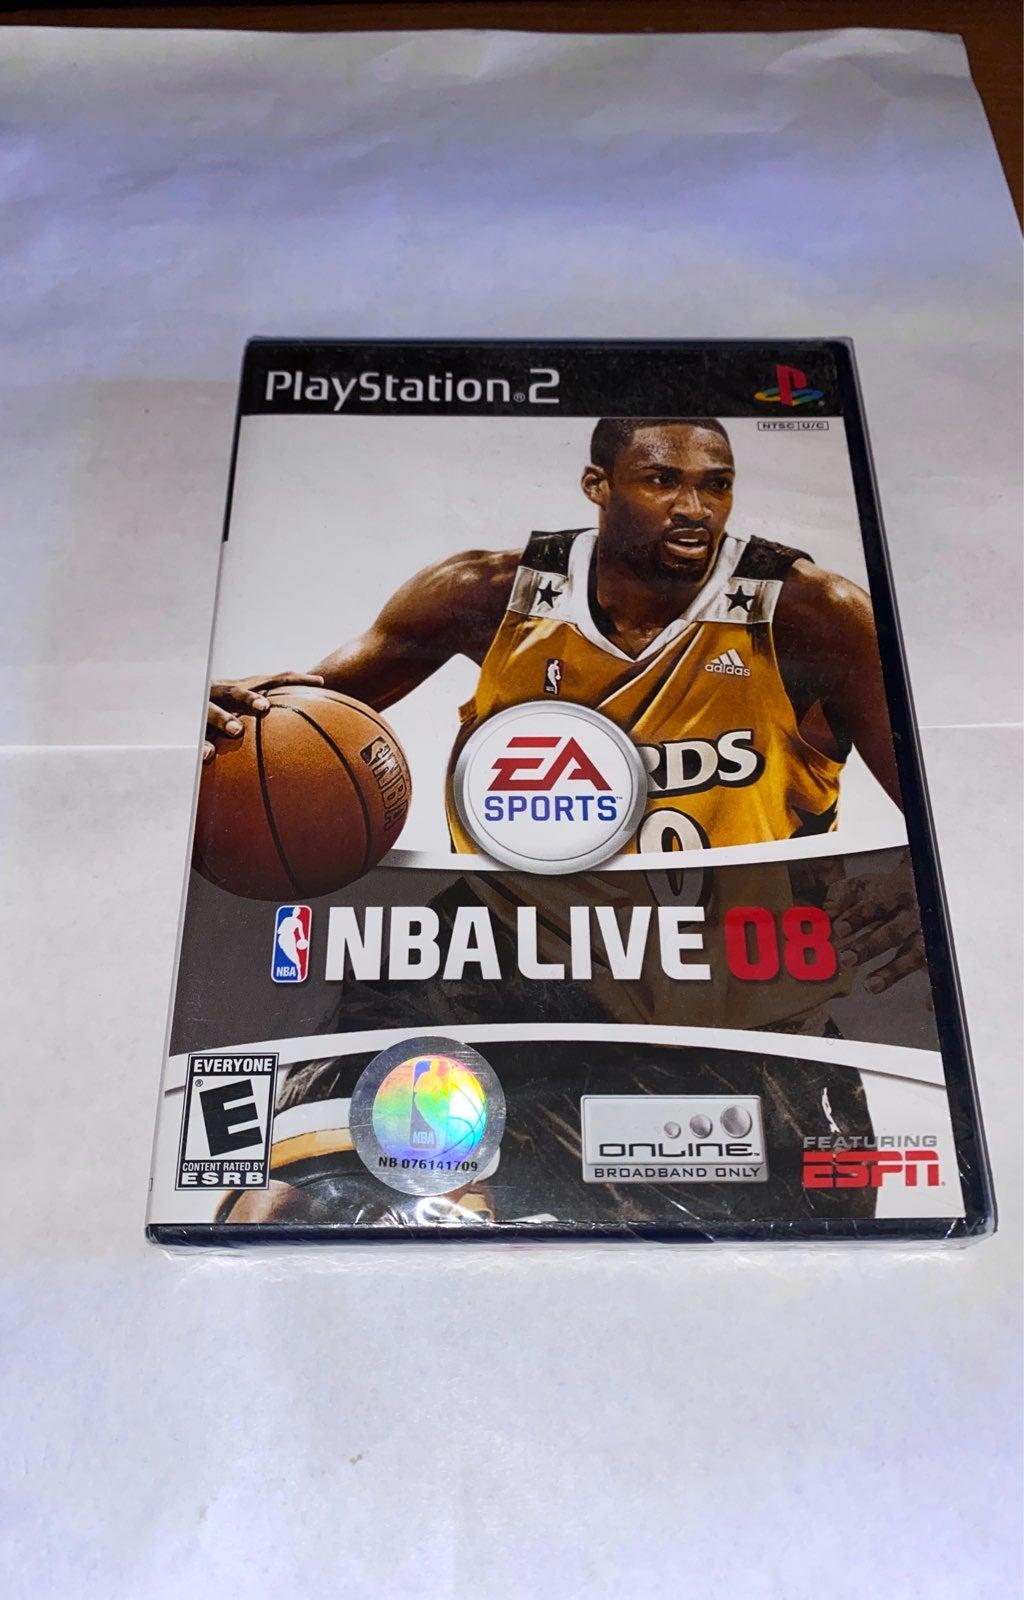 NBA Live 08 on Playstation 2